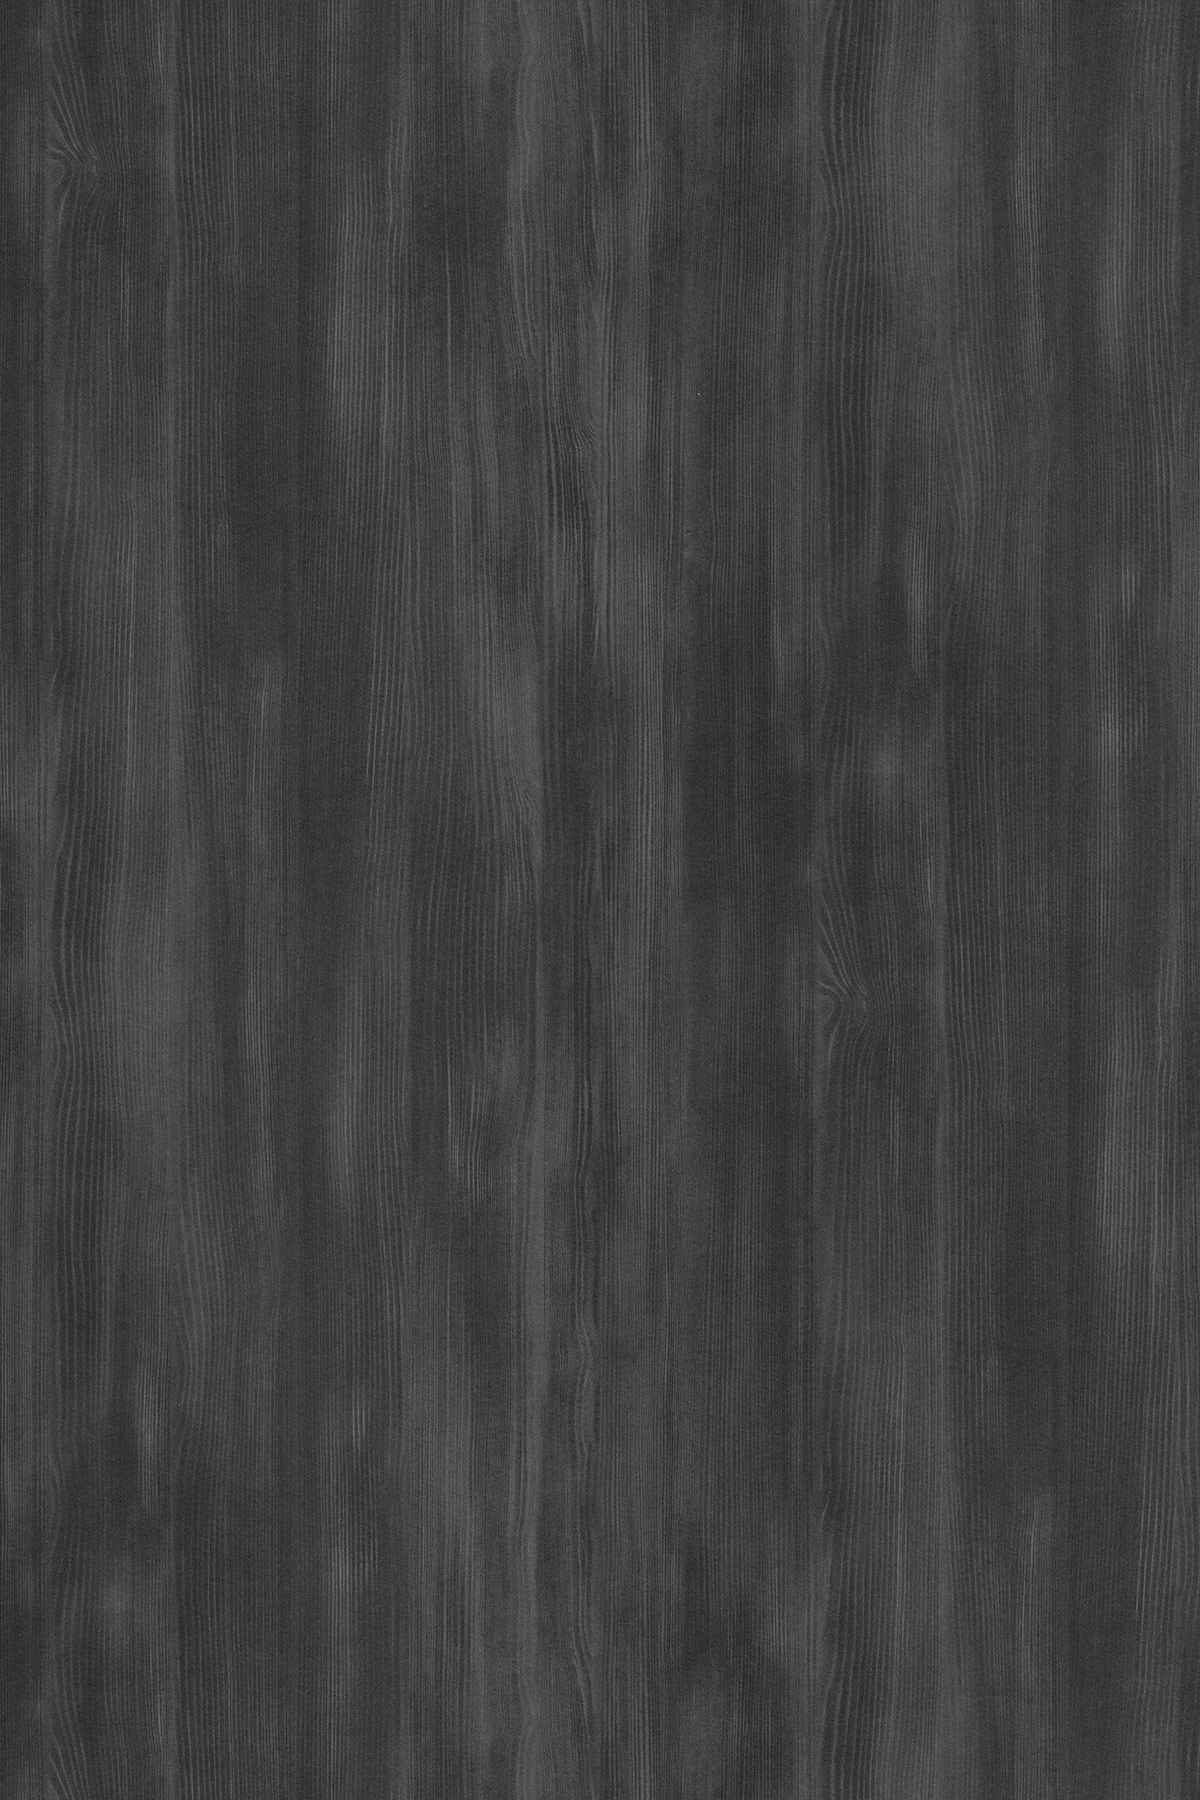 8509SN Северное Дерево Темное